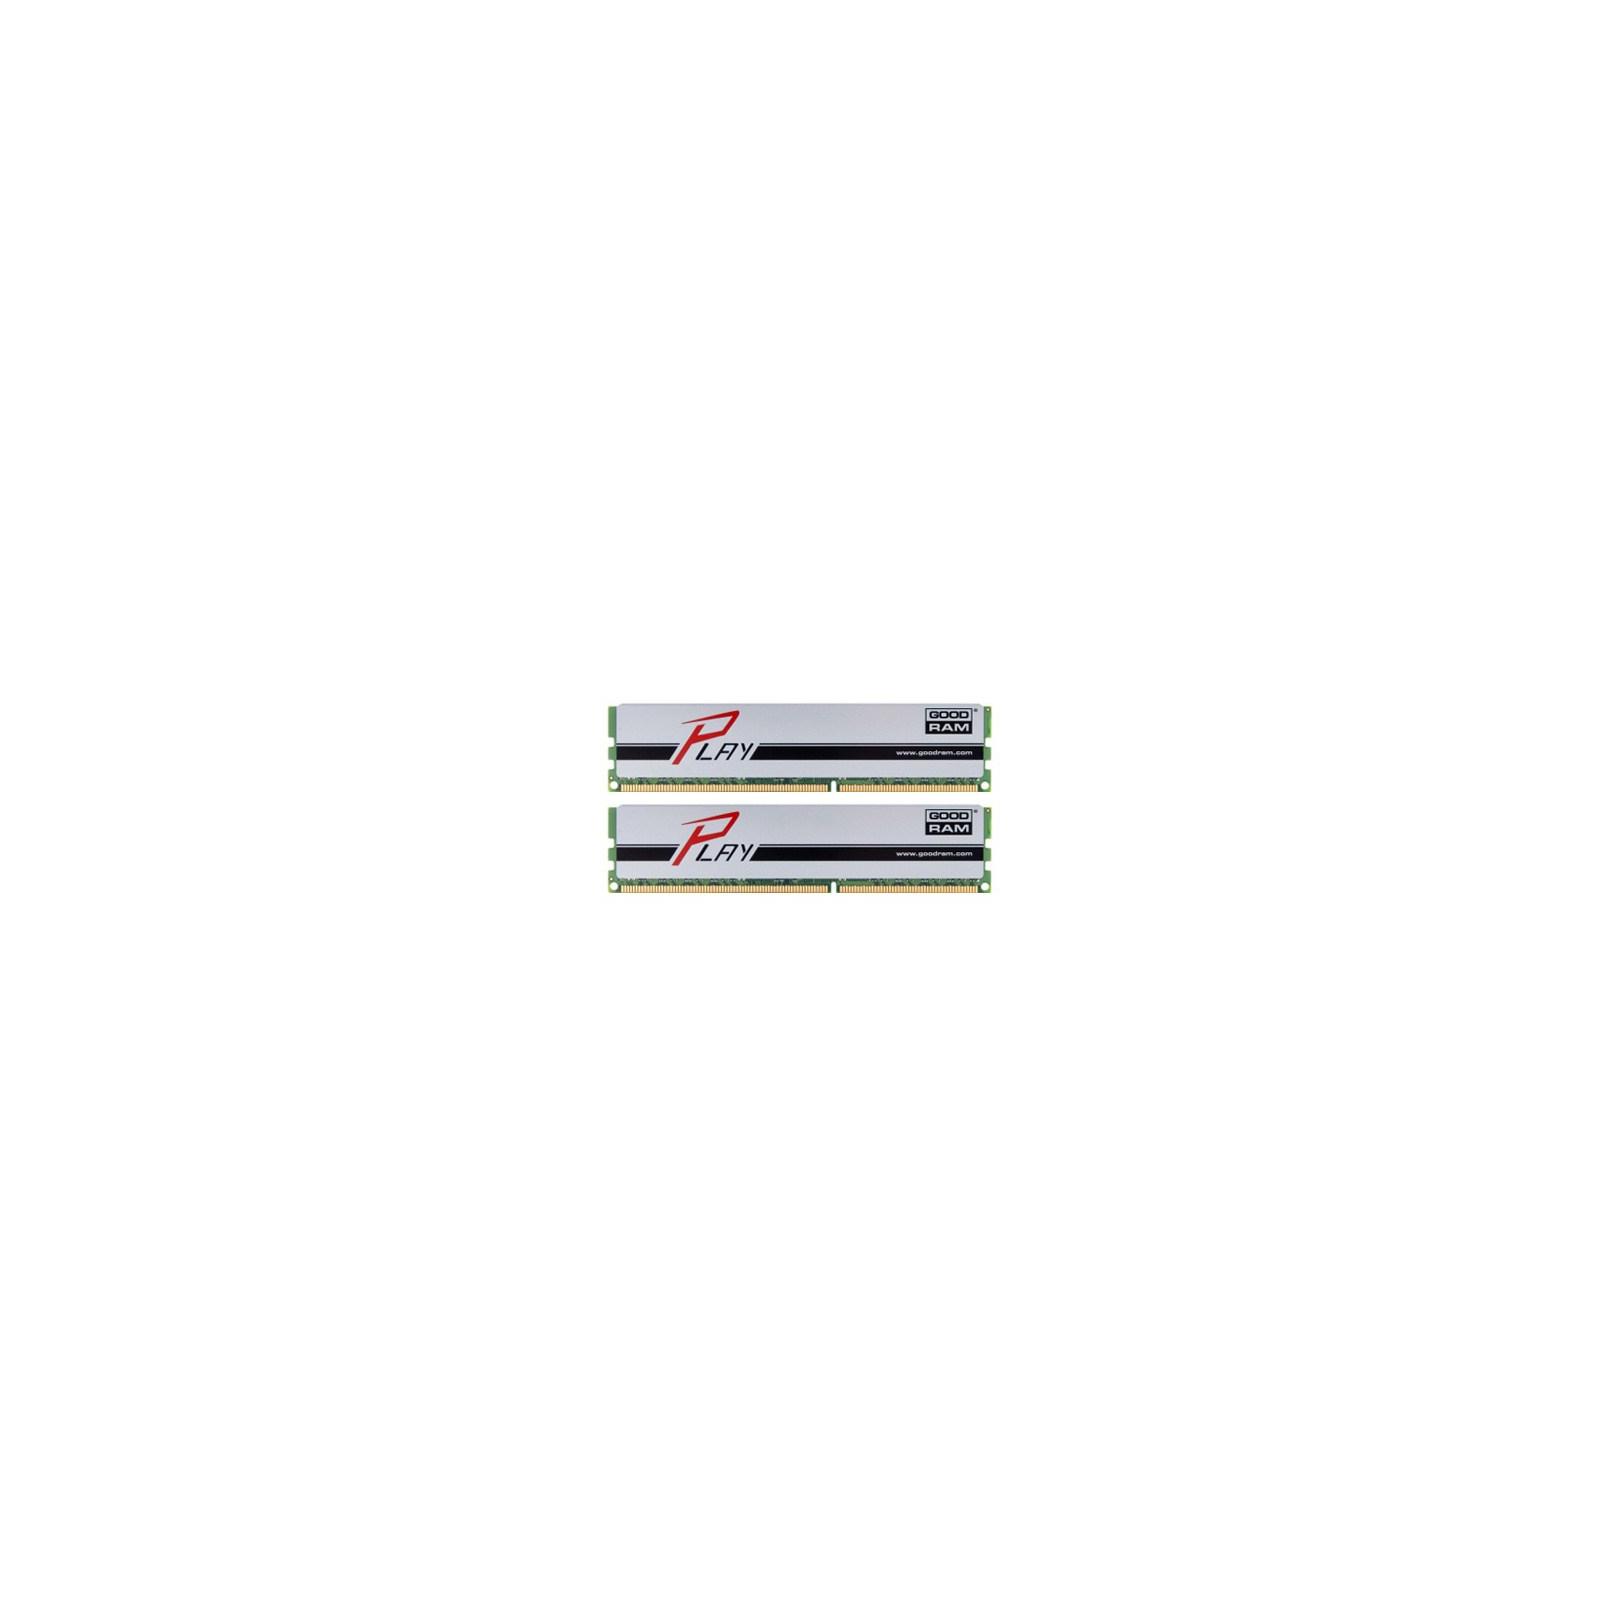 Модуль памяти для компьютера DDR3 8GB (2x4GB) 1600 MHz GOODRAM (GYS1600D364L9/8GDC)